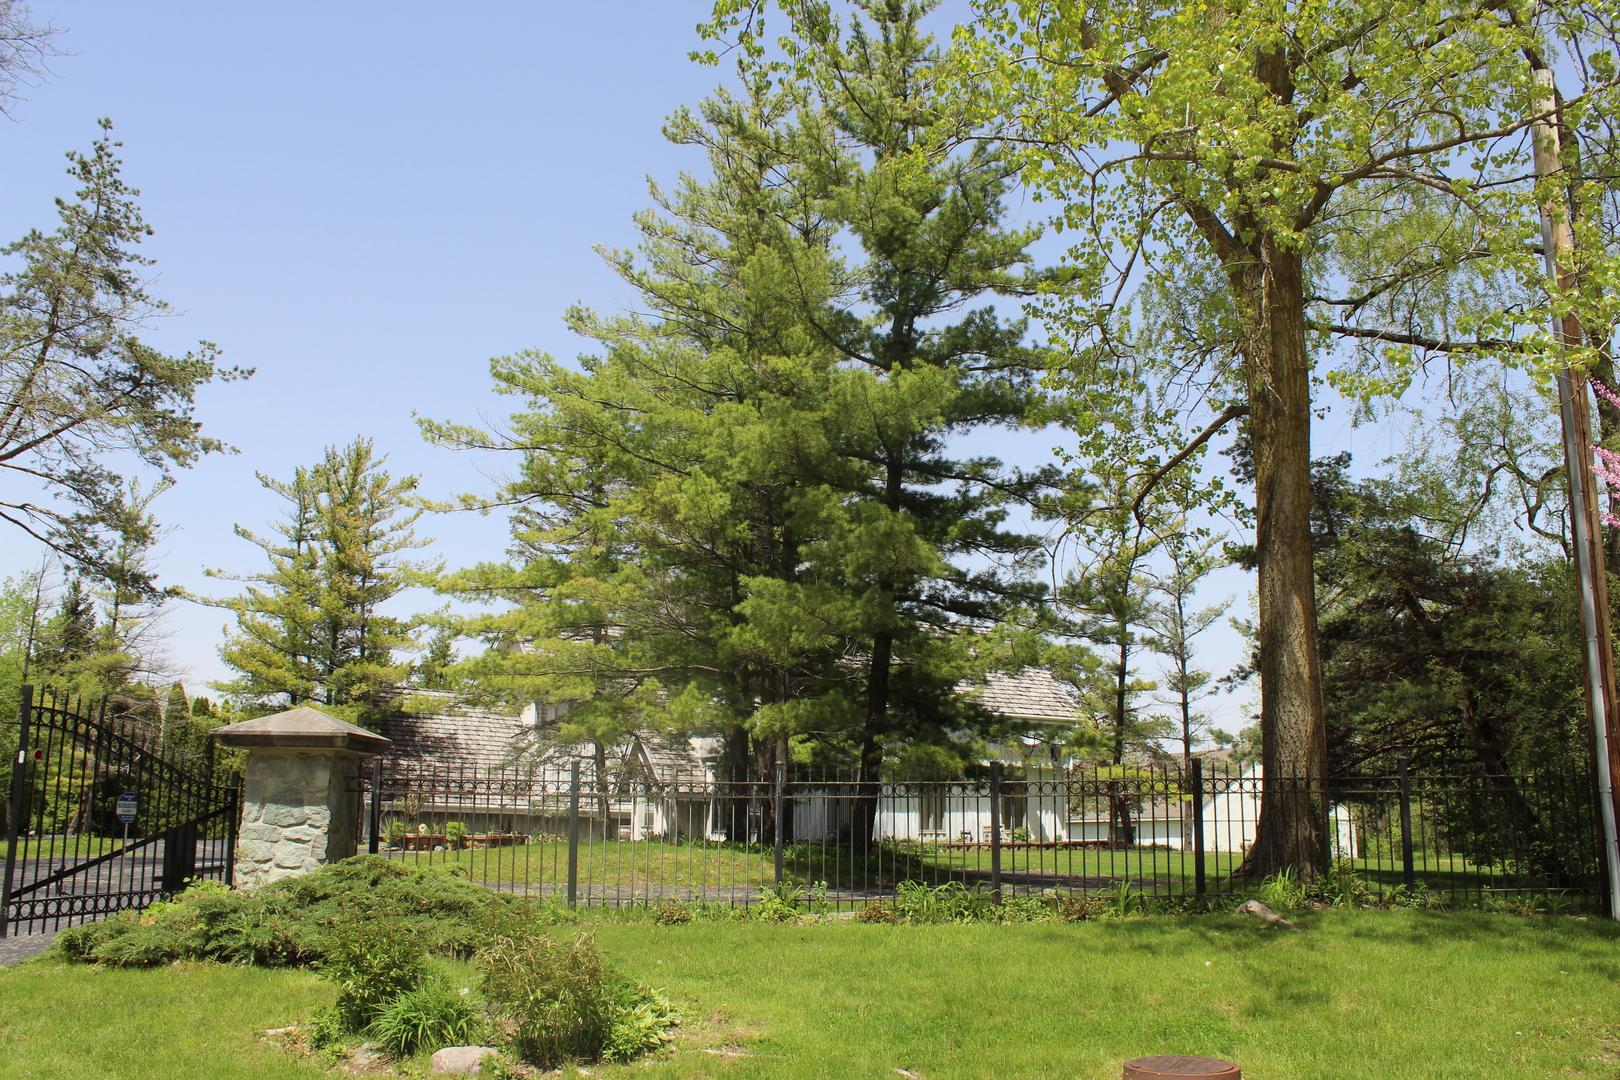 160 West Everett, Lake Forest, Illinois, 60045